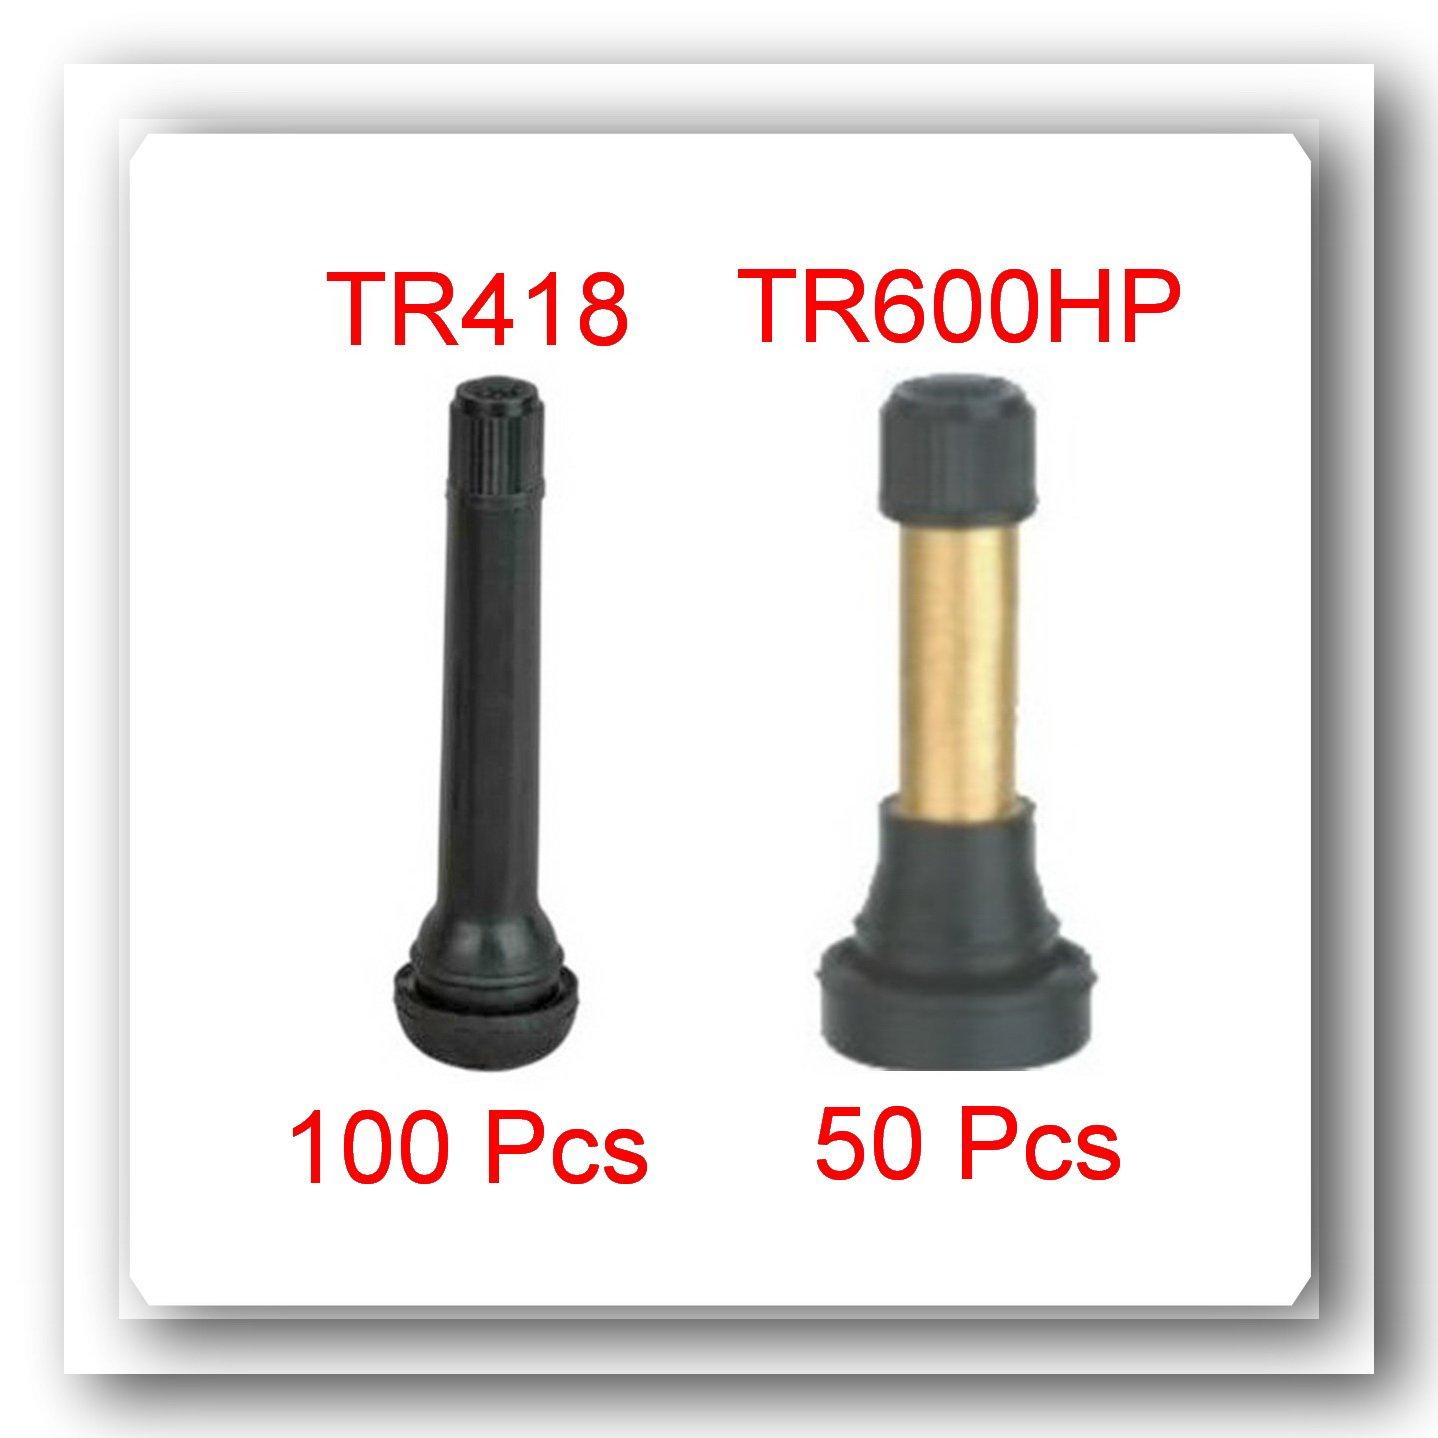 LOT 150 Snap-in Tubeless Rubber Valves (100 x TR418) (50 x TR602HP High Pressure Tire Wheel Valve Stem) V-PRO